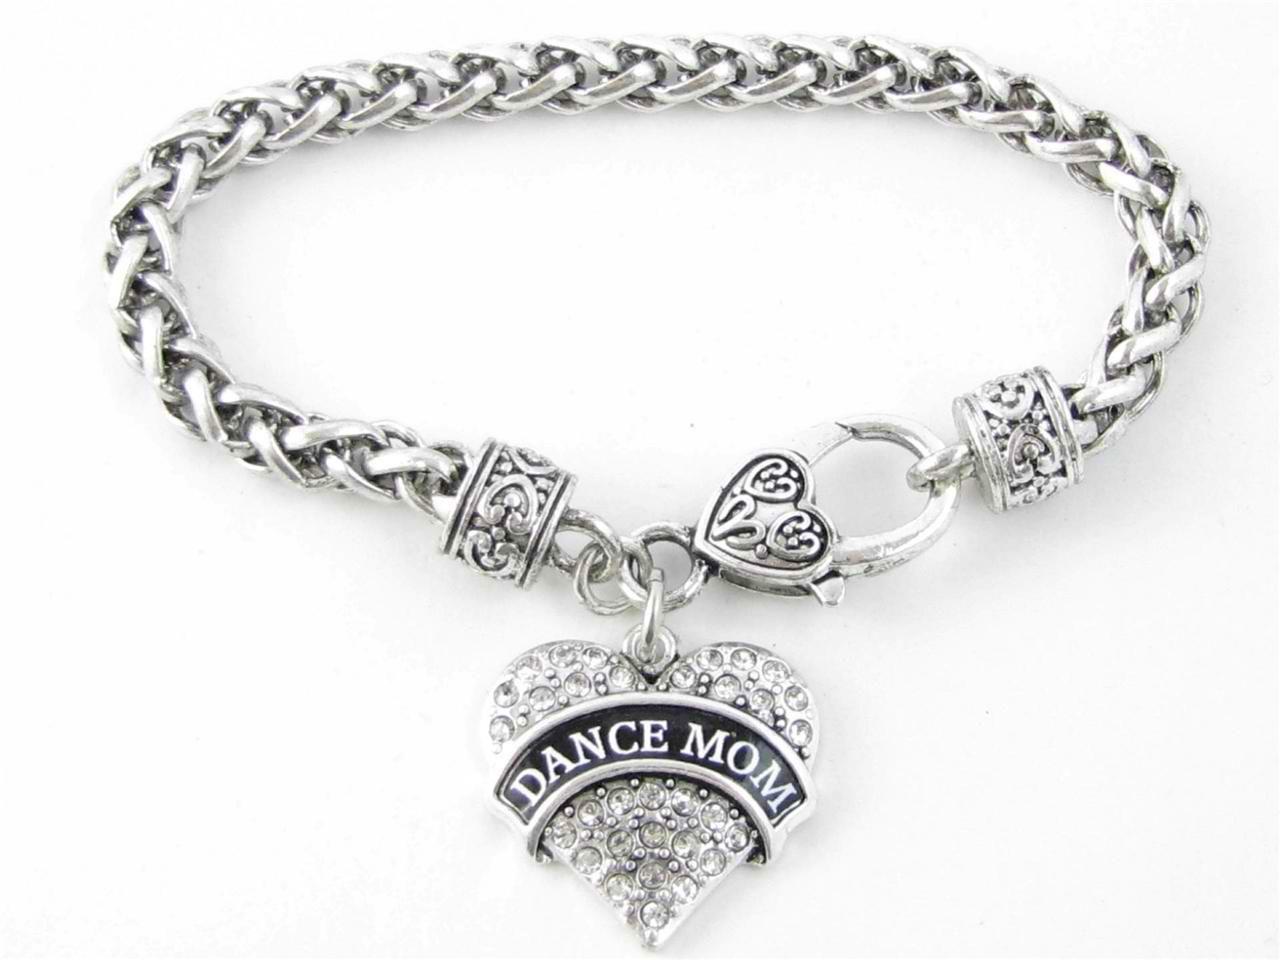 Dance mom heart bracelet shoppingwithadam jewelry